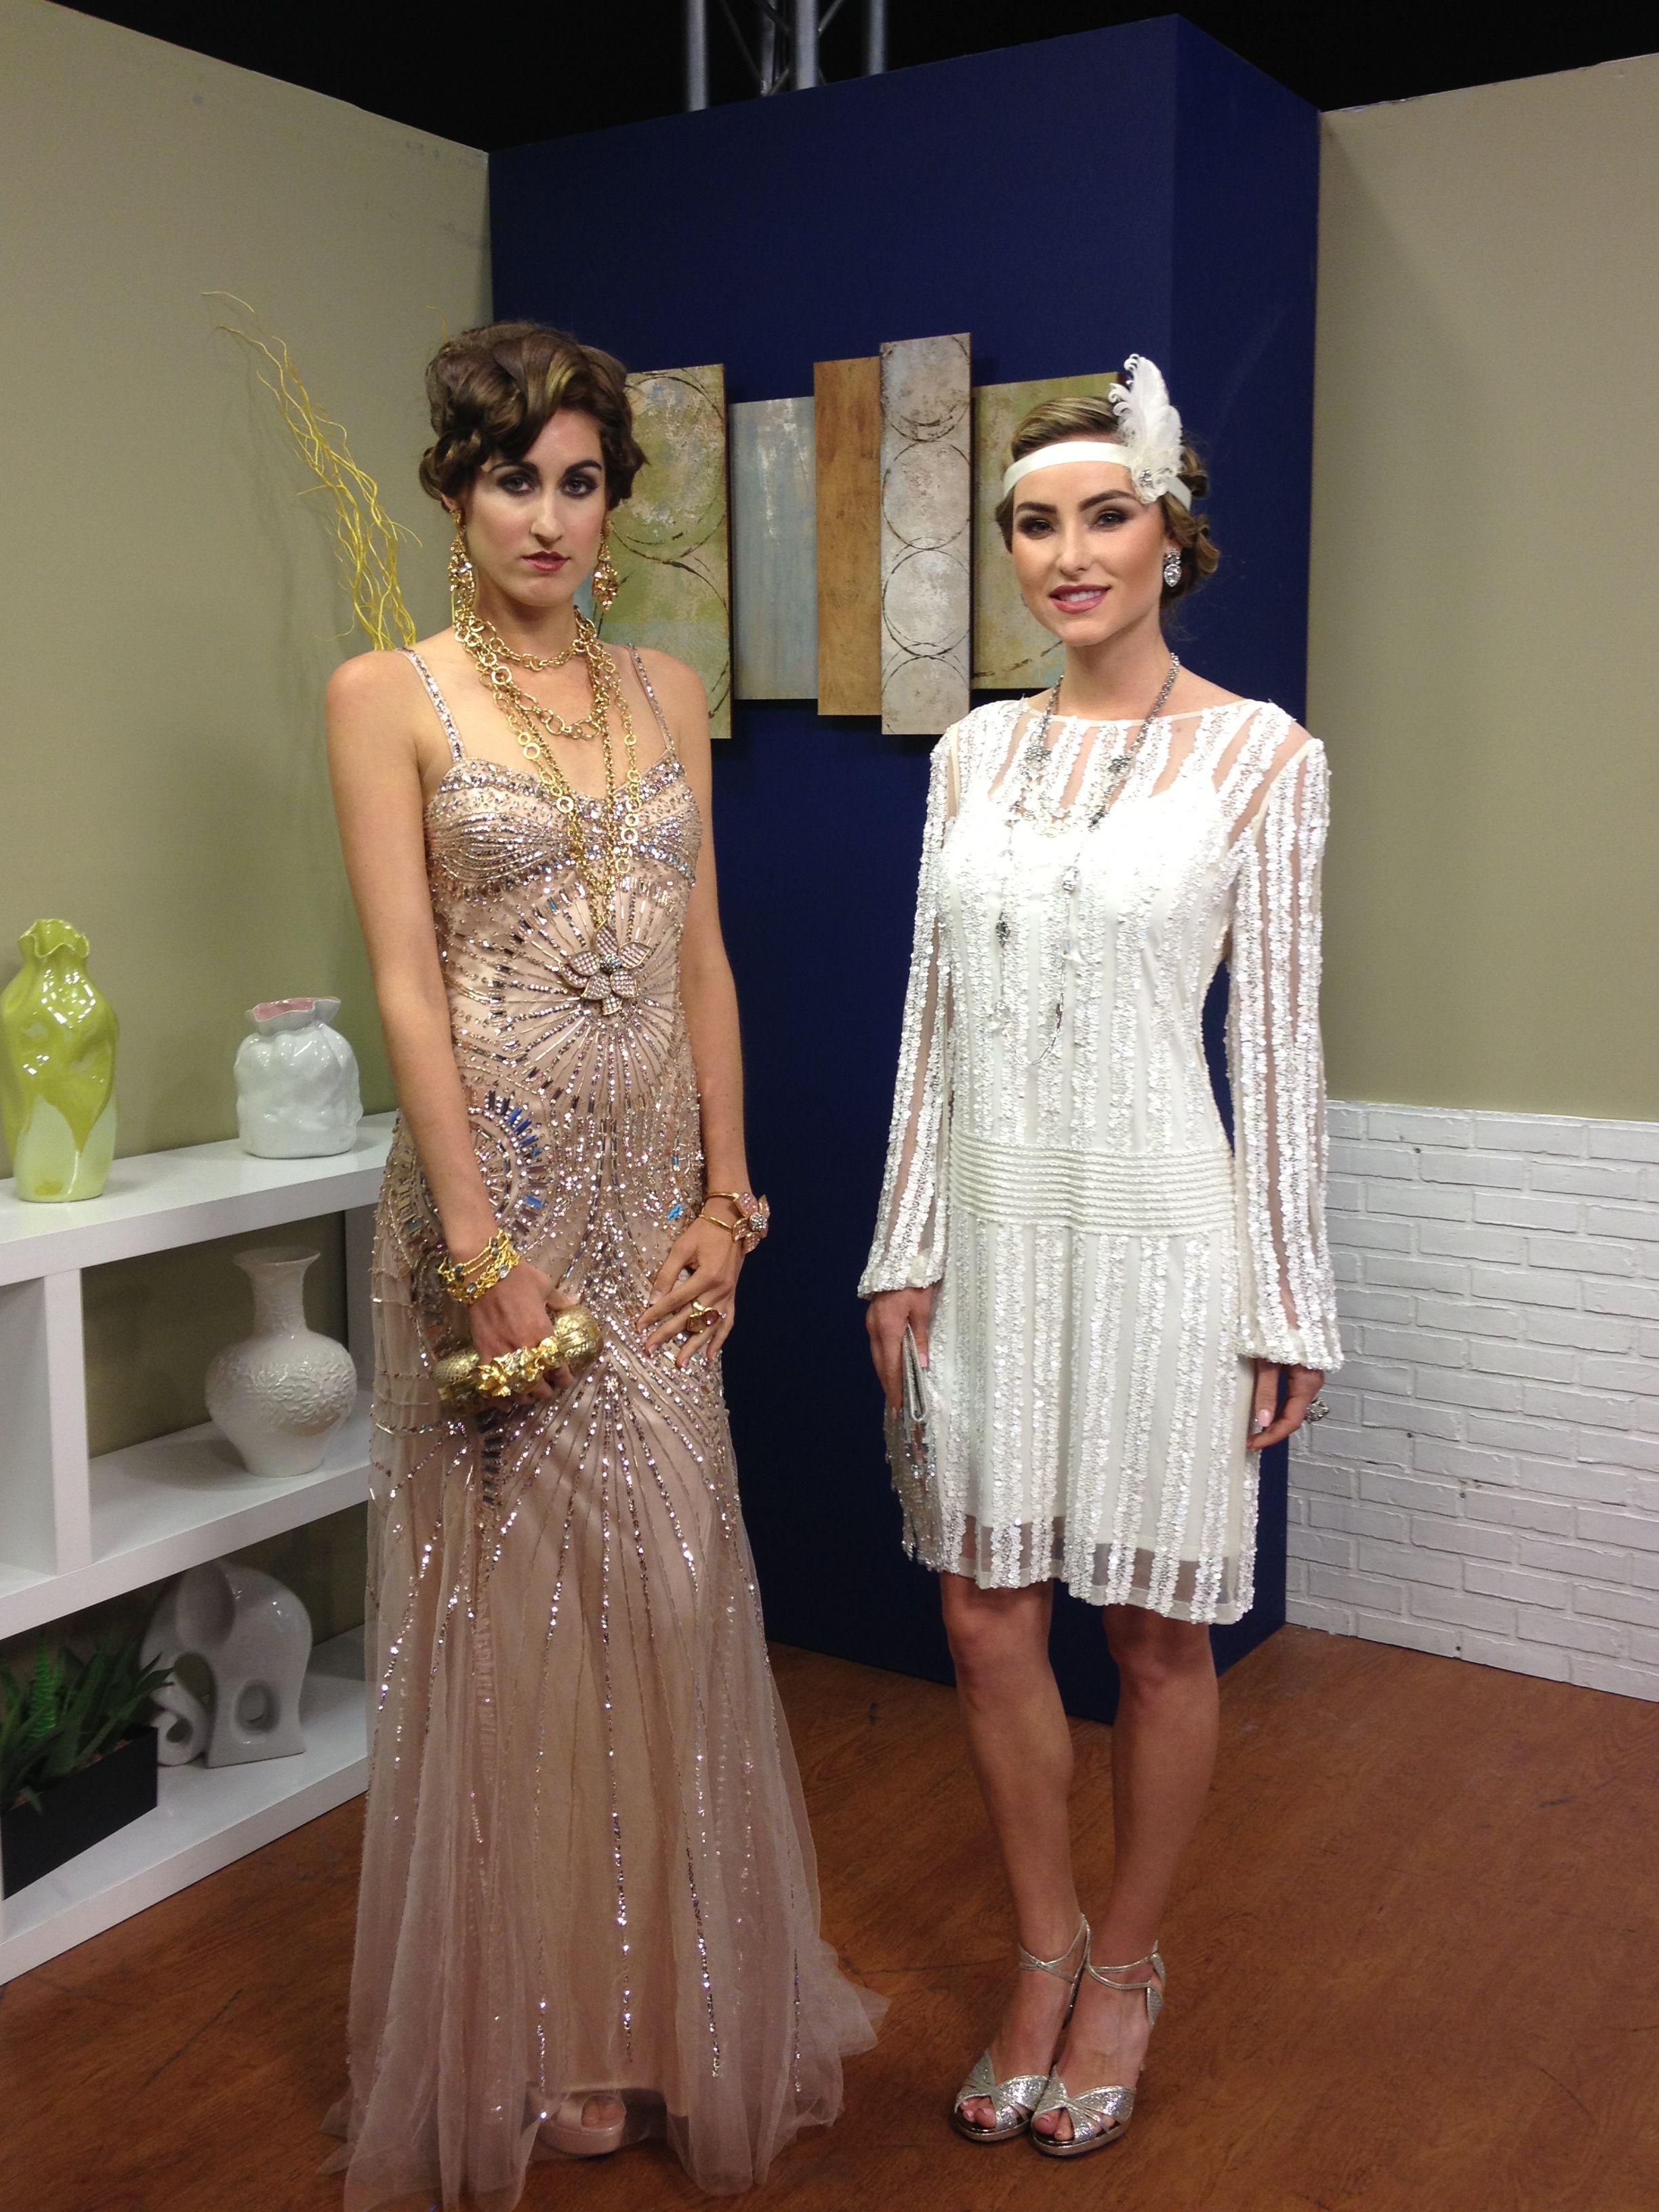 gatsby style wedding dresses | Melanie Pace | EVERYTHING FASHION ...